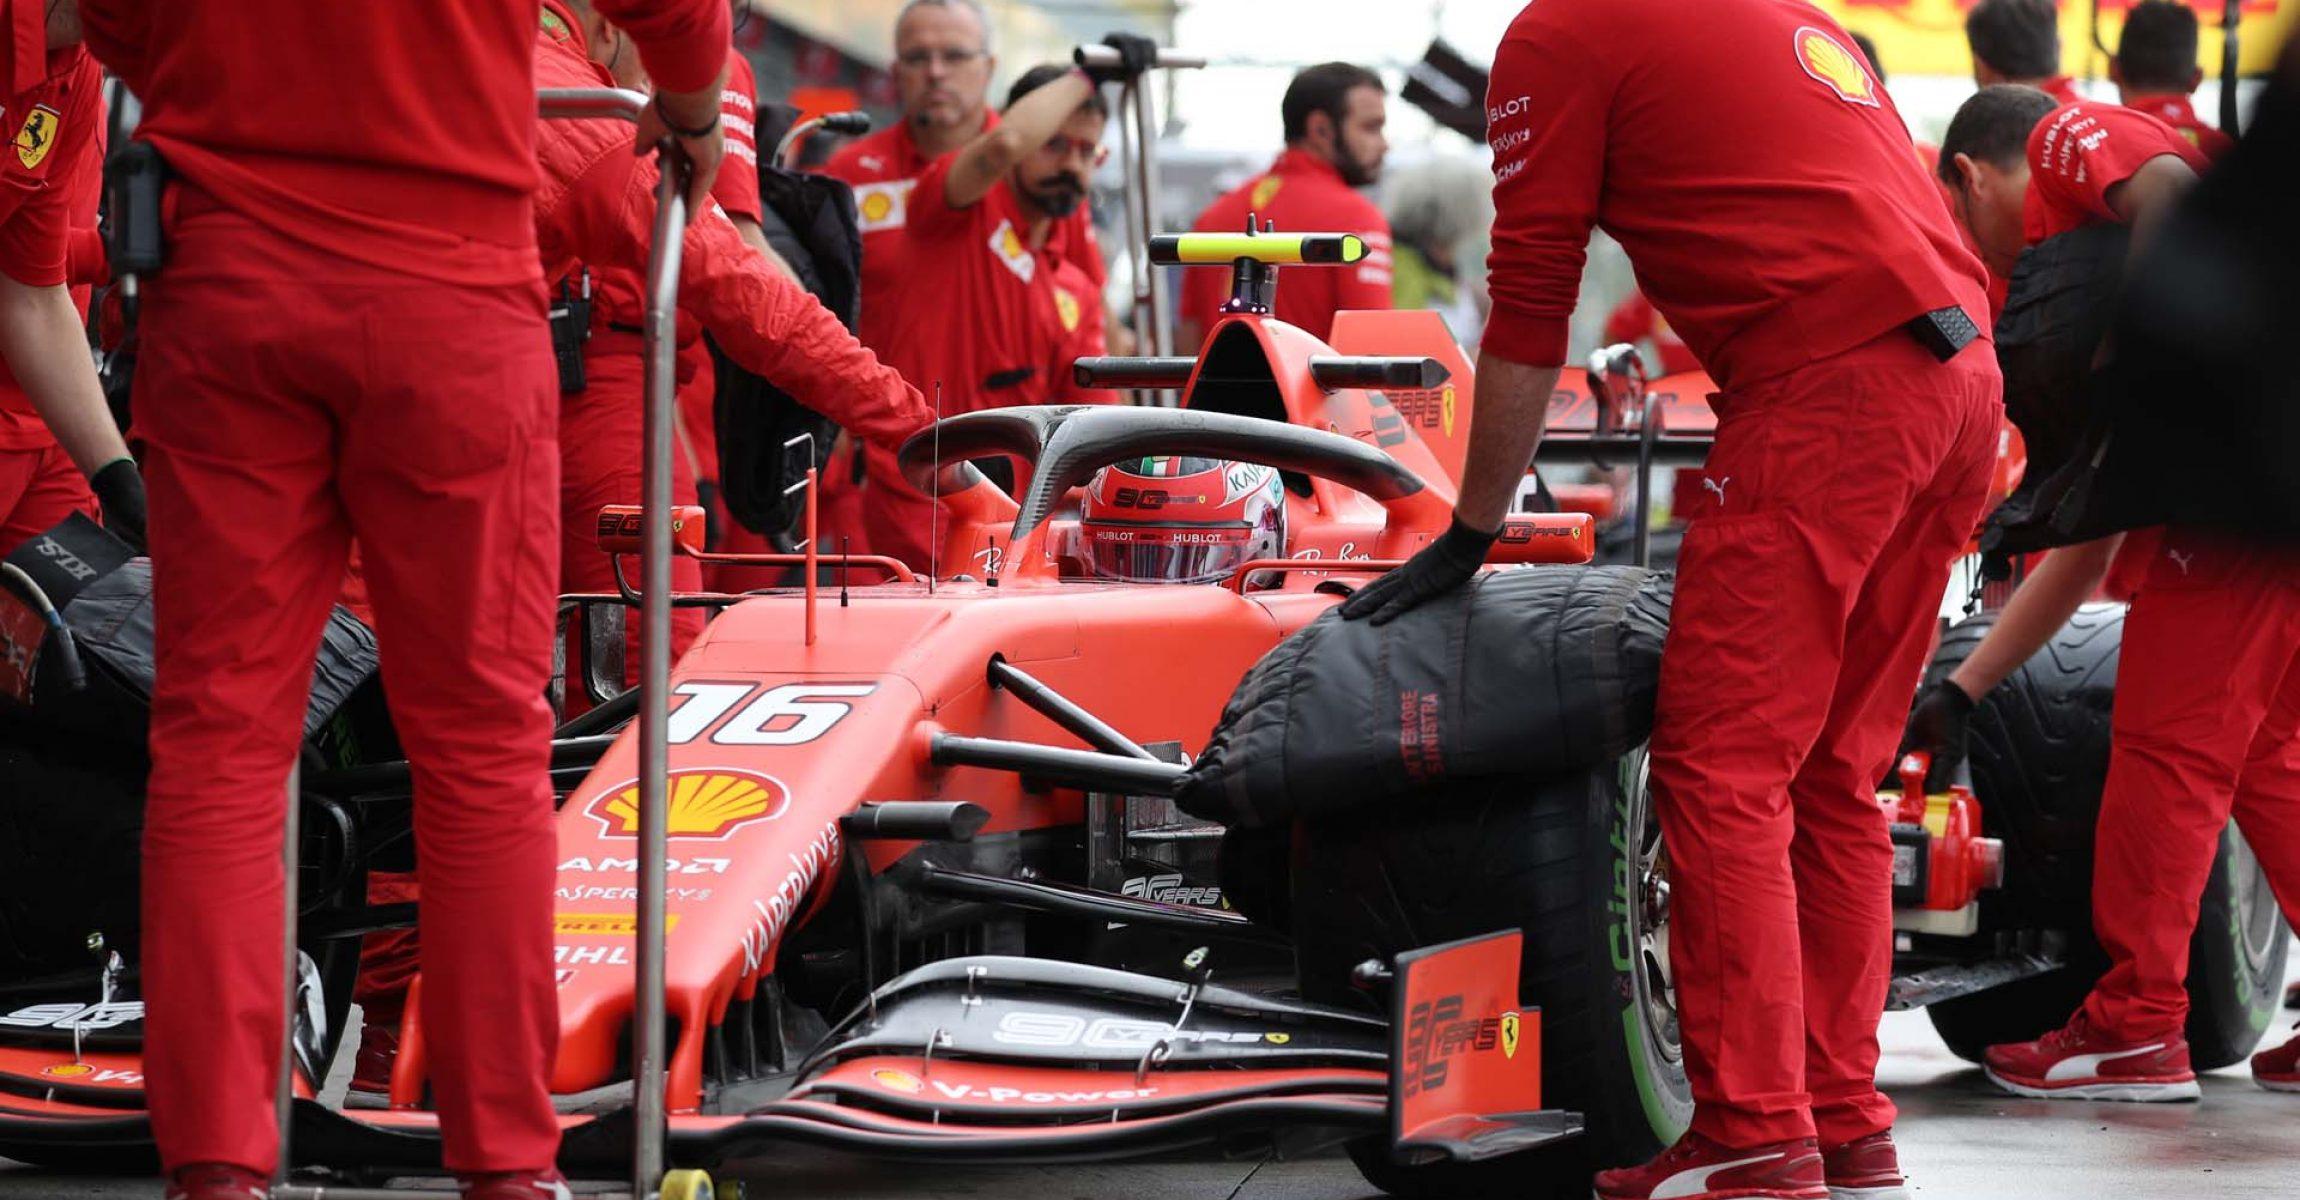 Italy, Italian Grand Prix 2019, Monza,  Charles Leclerc, Ferrari, tyre blankets